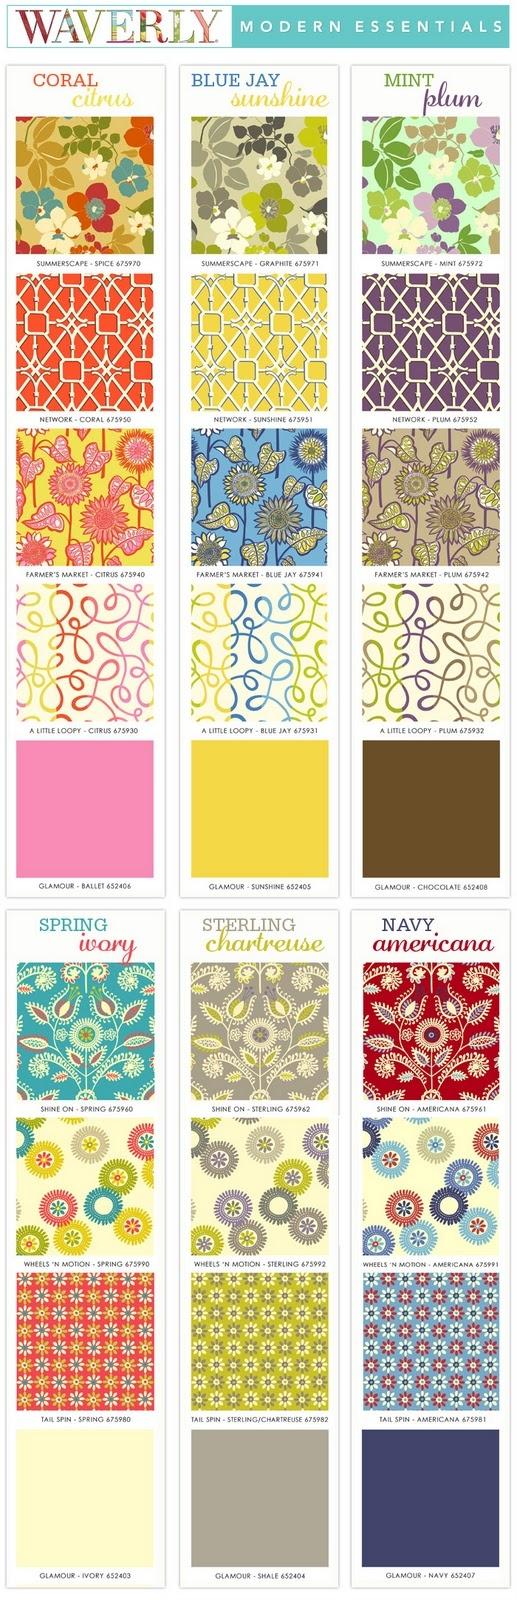 Waverly Modern Essentials: Fabrics Thes Swatch, Fabrics Colors Ideas, Fabulous Fabrics, Fabrics Swatch, Fabric Swatches, Waverly Fabrics Thes, Texture Colors Patterns, Fabrics Inspiration, Colors Inspiration